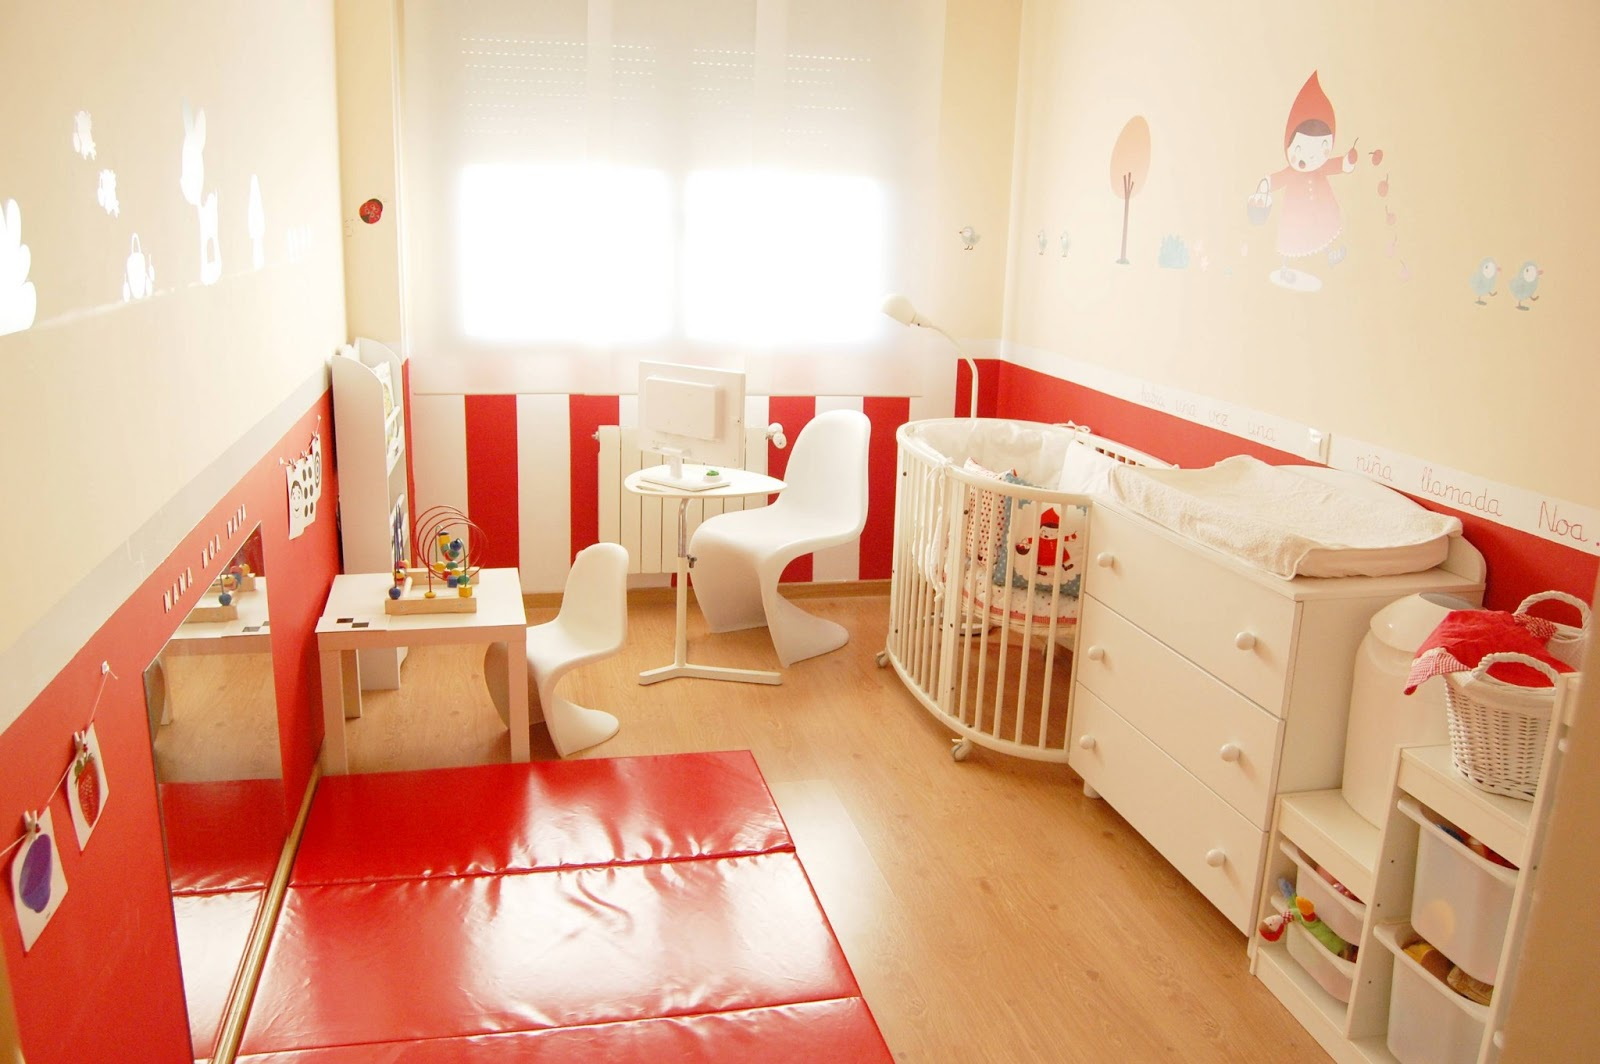 habitacion de bebe decorada en rojo, cuna ikea, vertbaudet, stokke ...